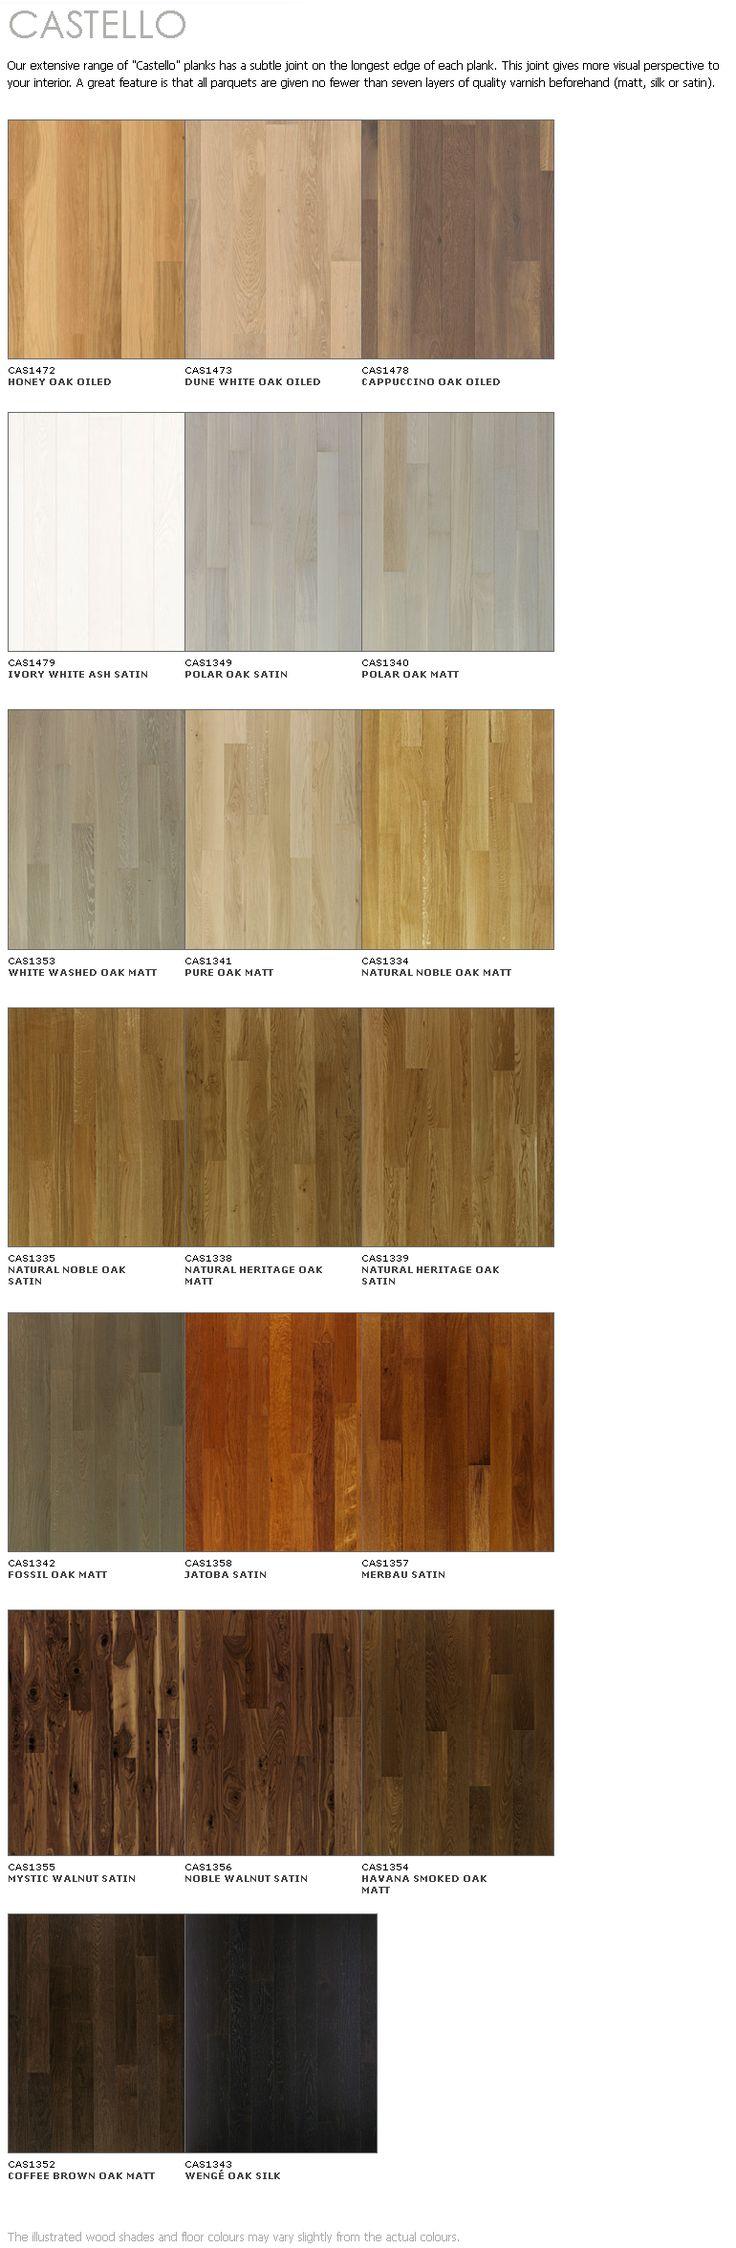 Castello Parquet Engineered Wood Flooring